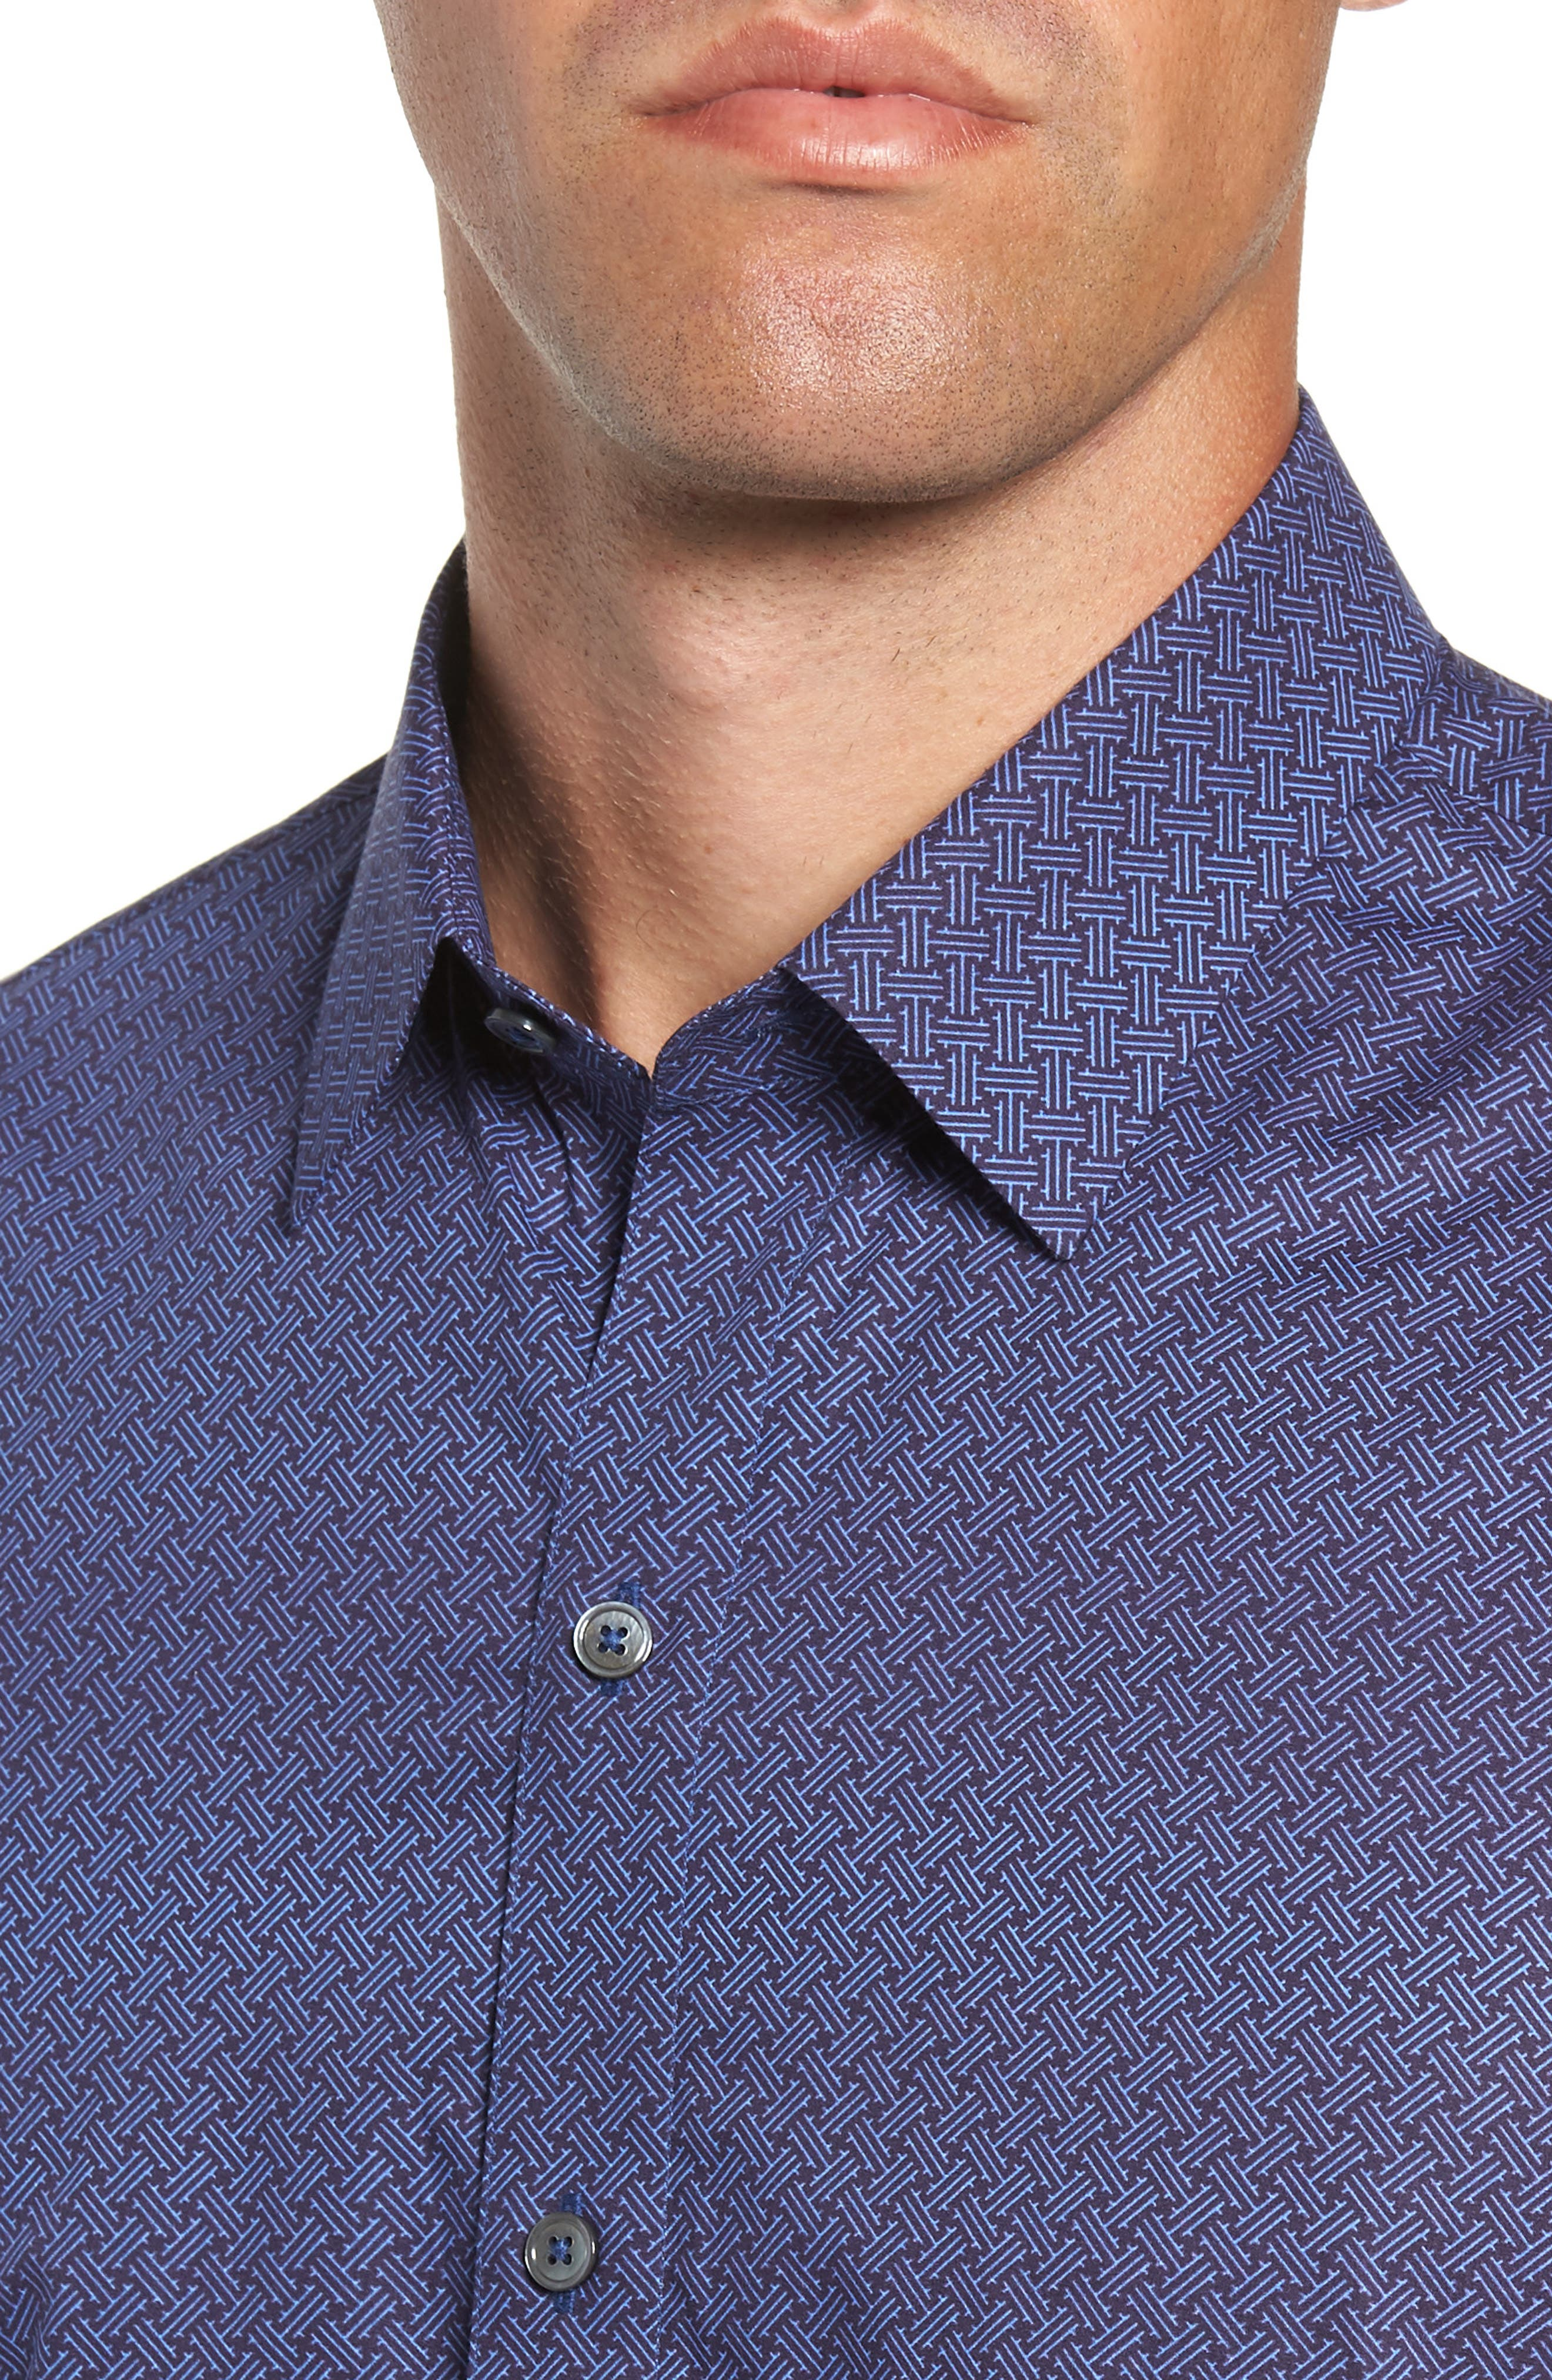 Singh Regular Fit Sport Shirt,                             Alternate thumbnail 2, color,                             NAVY